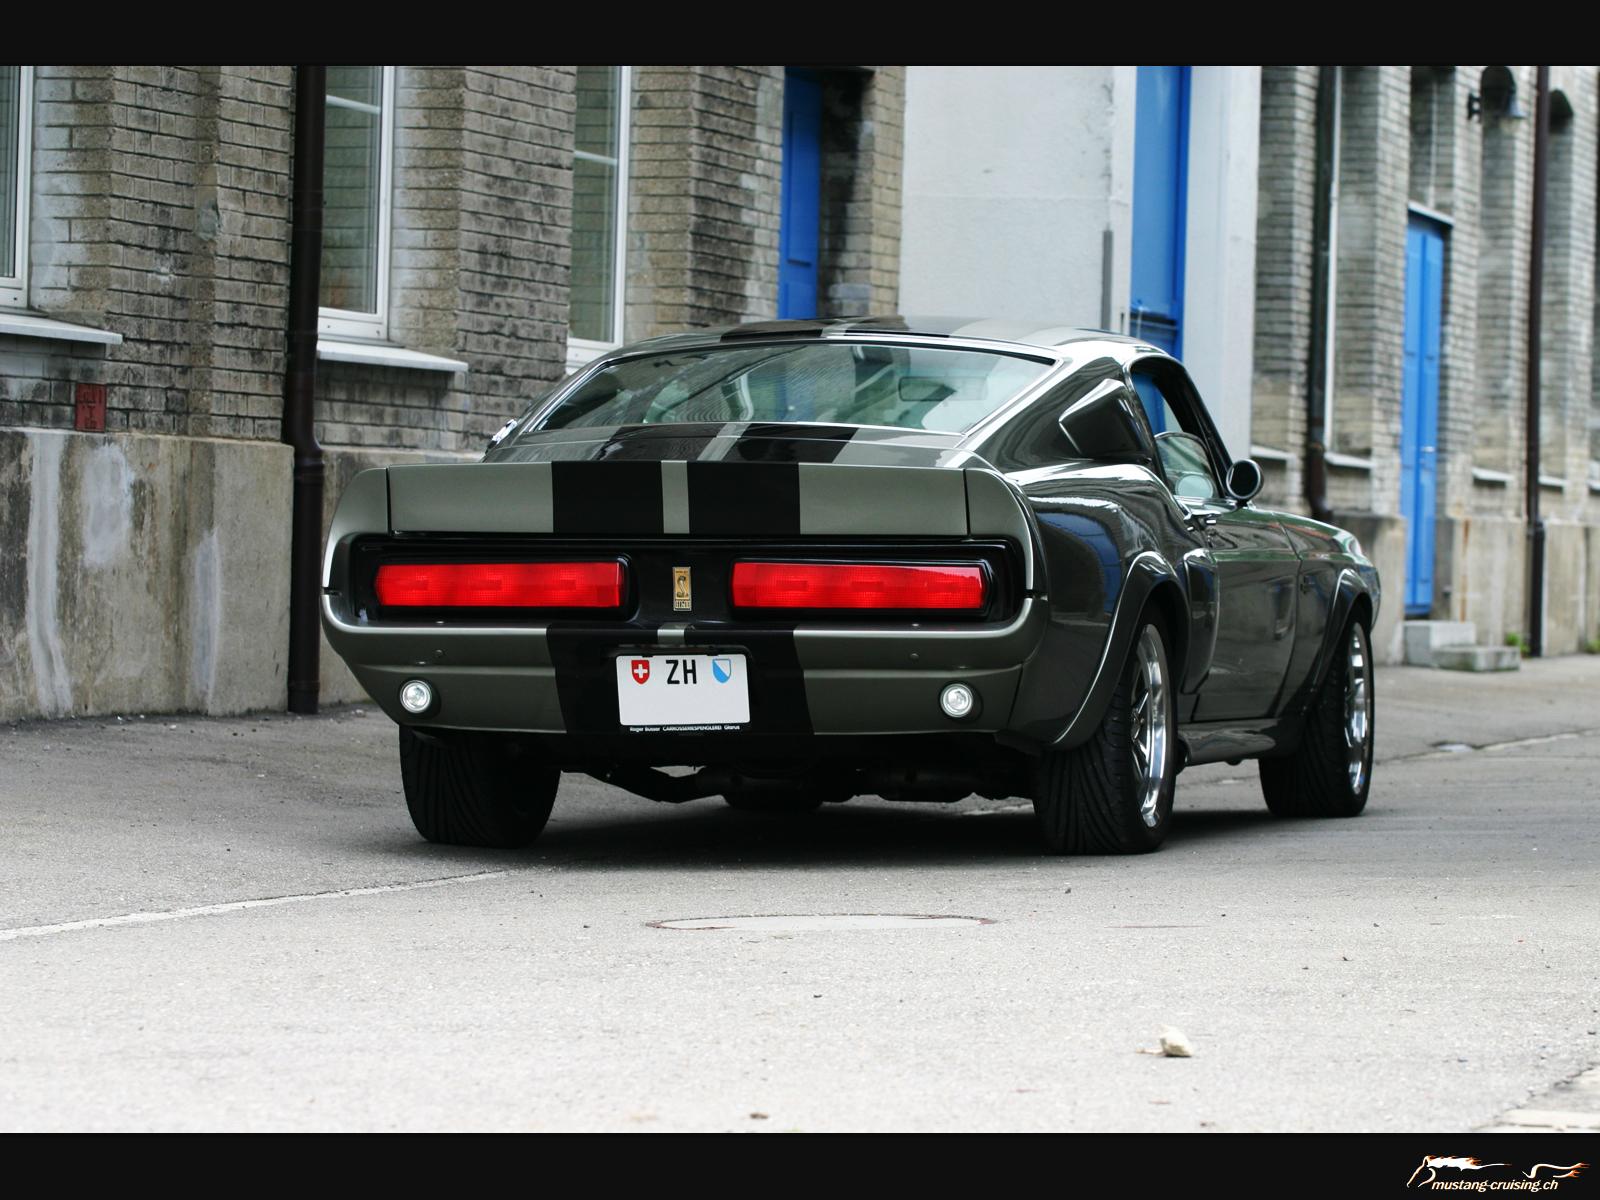 http://4.bp.blogspot.com/_rEhkmFqBmF4/TUwklk7idLI/AAAAAAAAPSA/VoCo1Dki0GU/s1600/Wallpaper+Ford+Mustang+Eleanor+1967.jpg